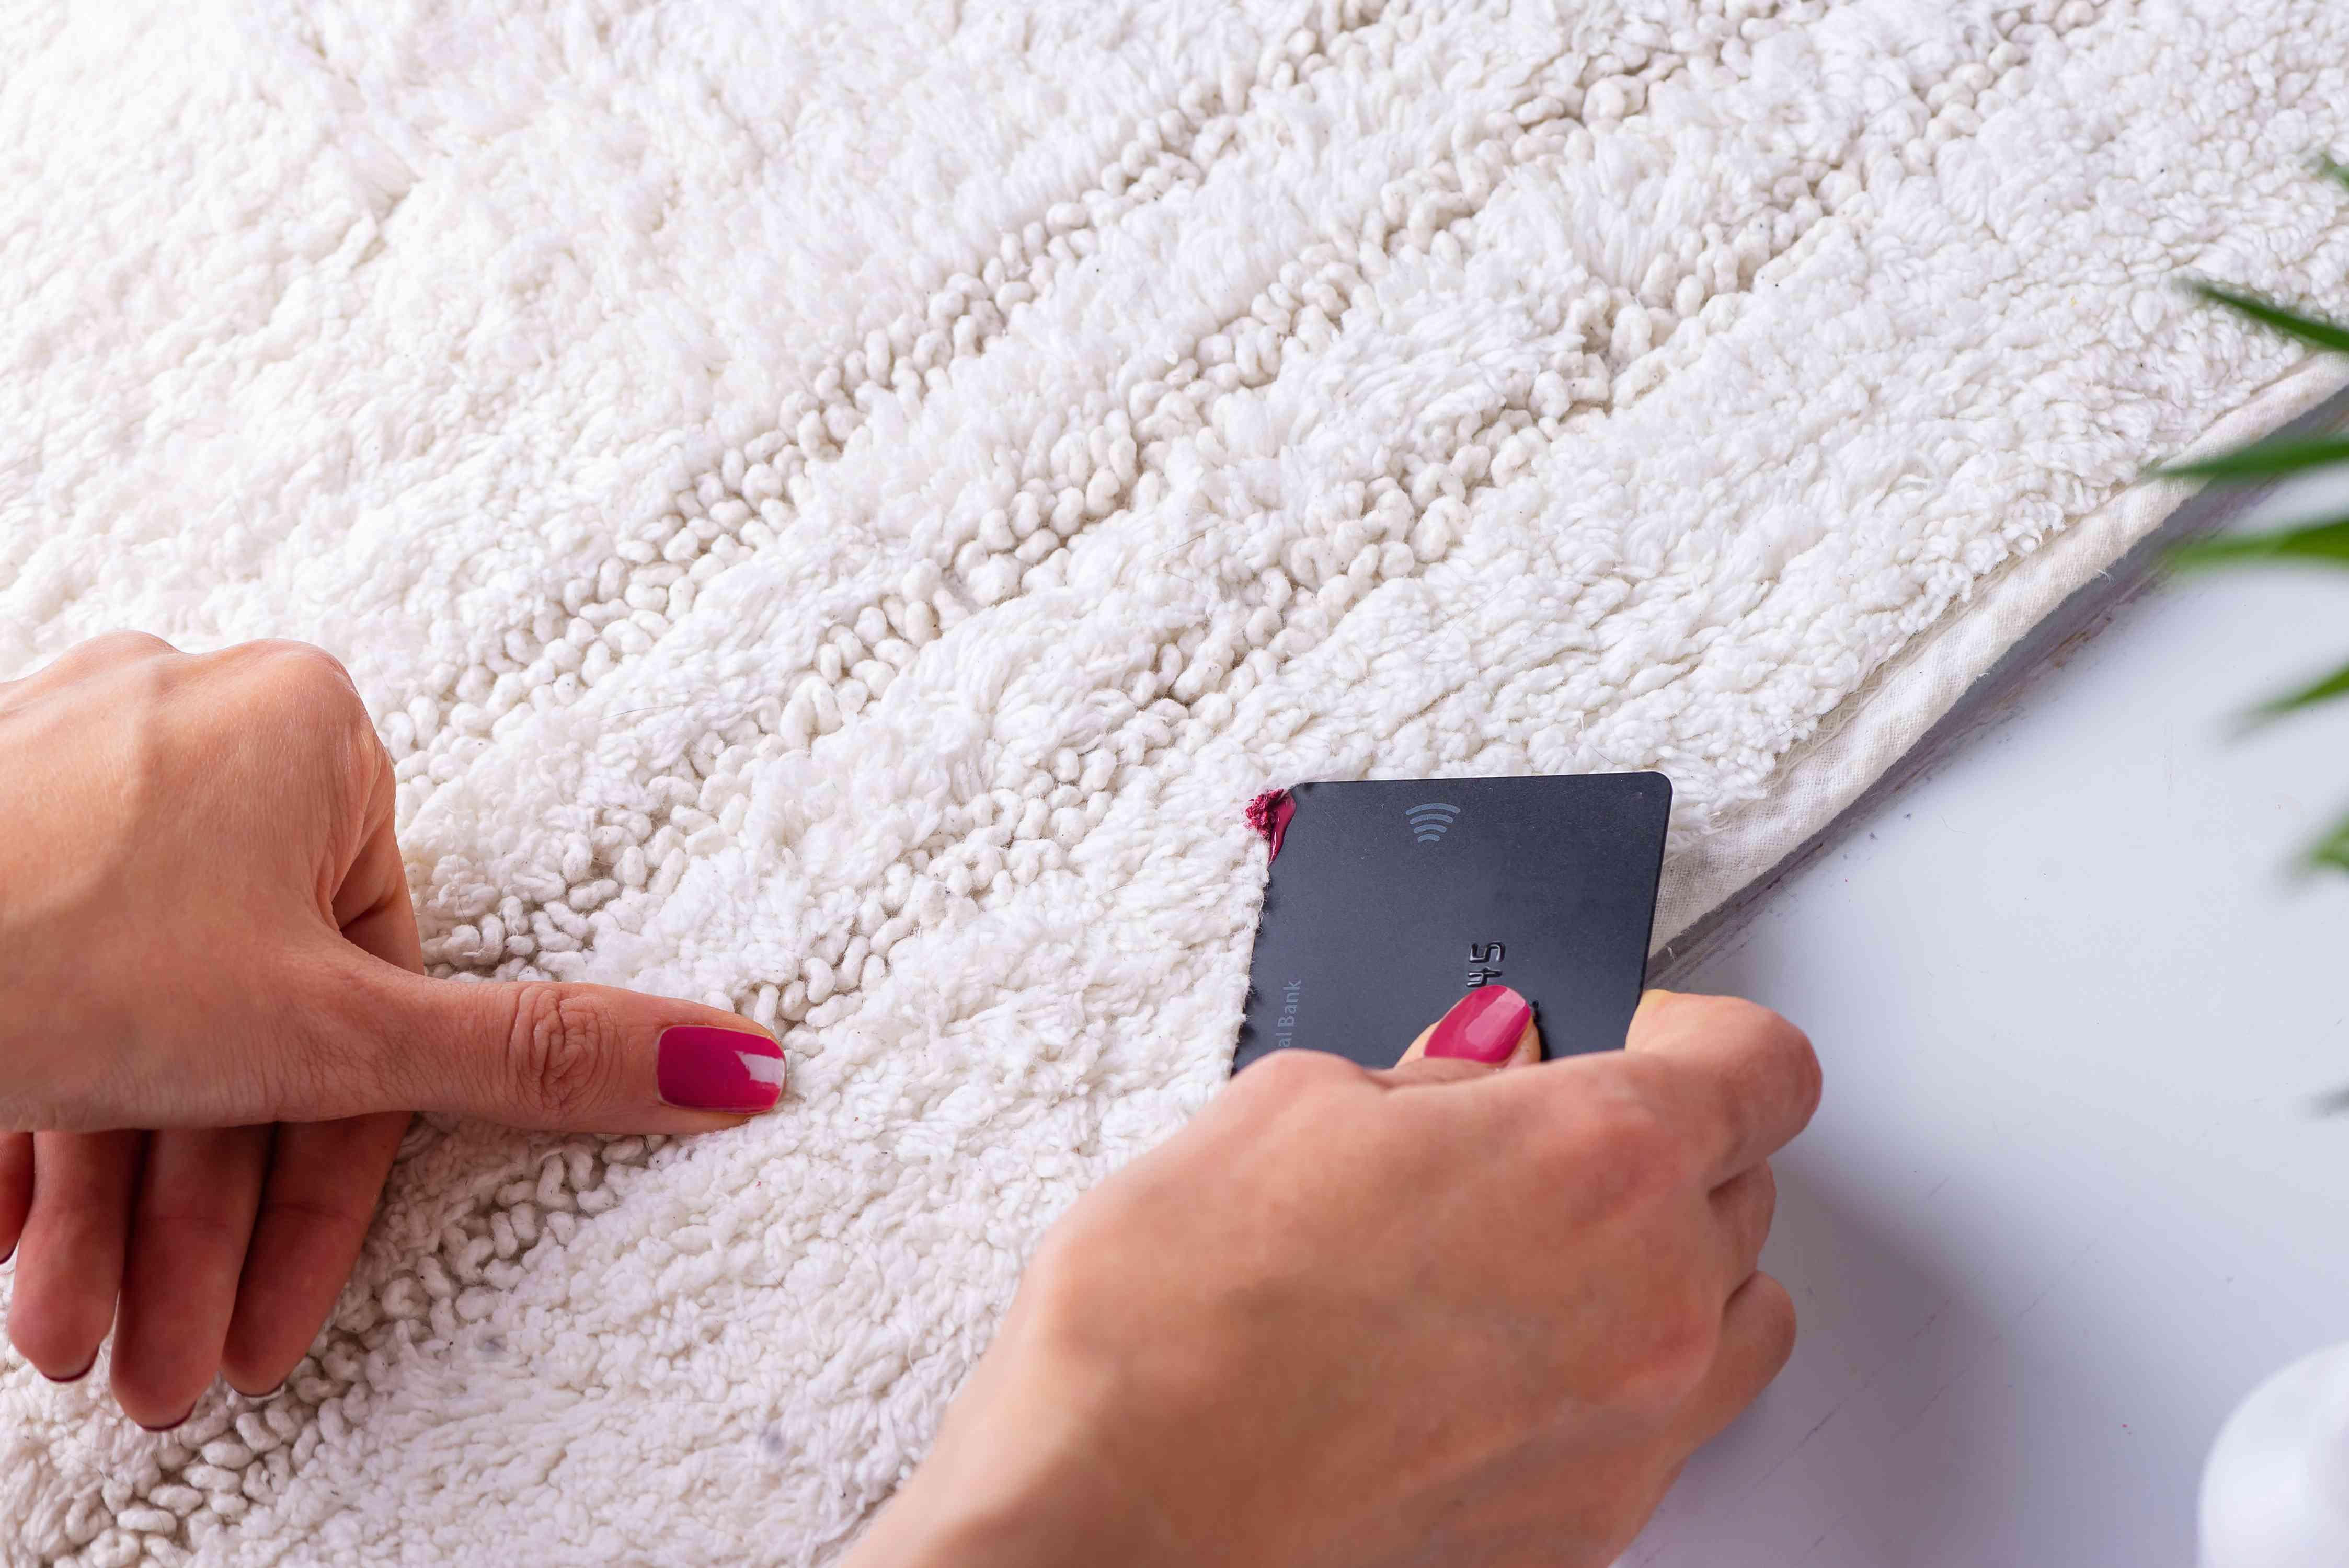 using a credit card to scrape away extra nail polish